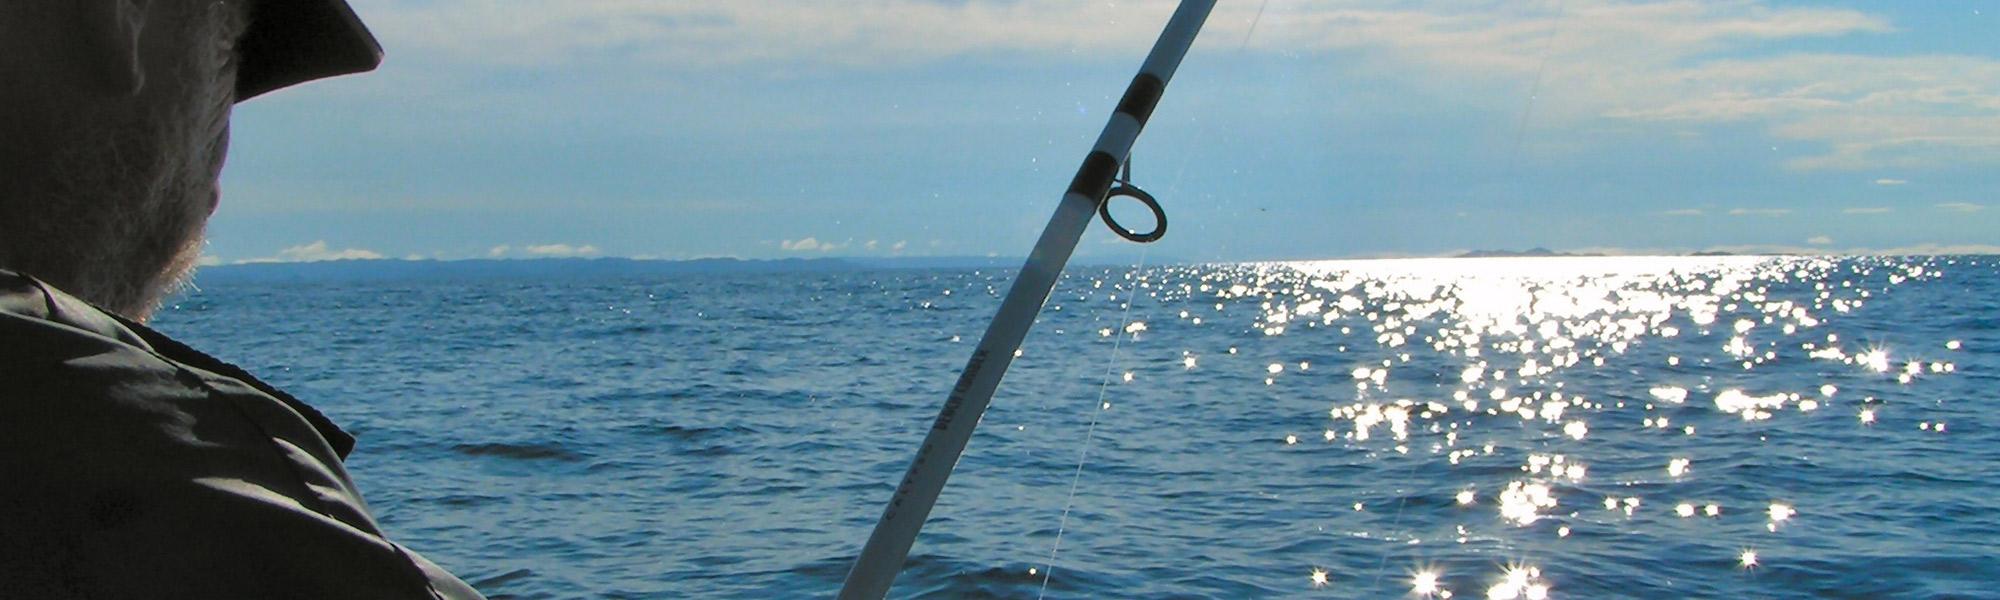 Myrtle Beach Fishing Boat